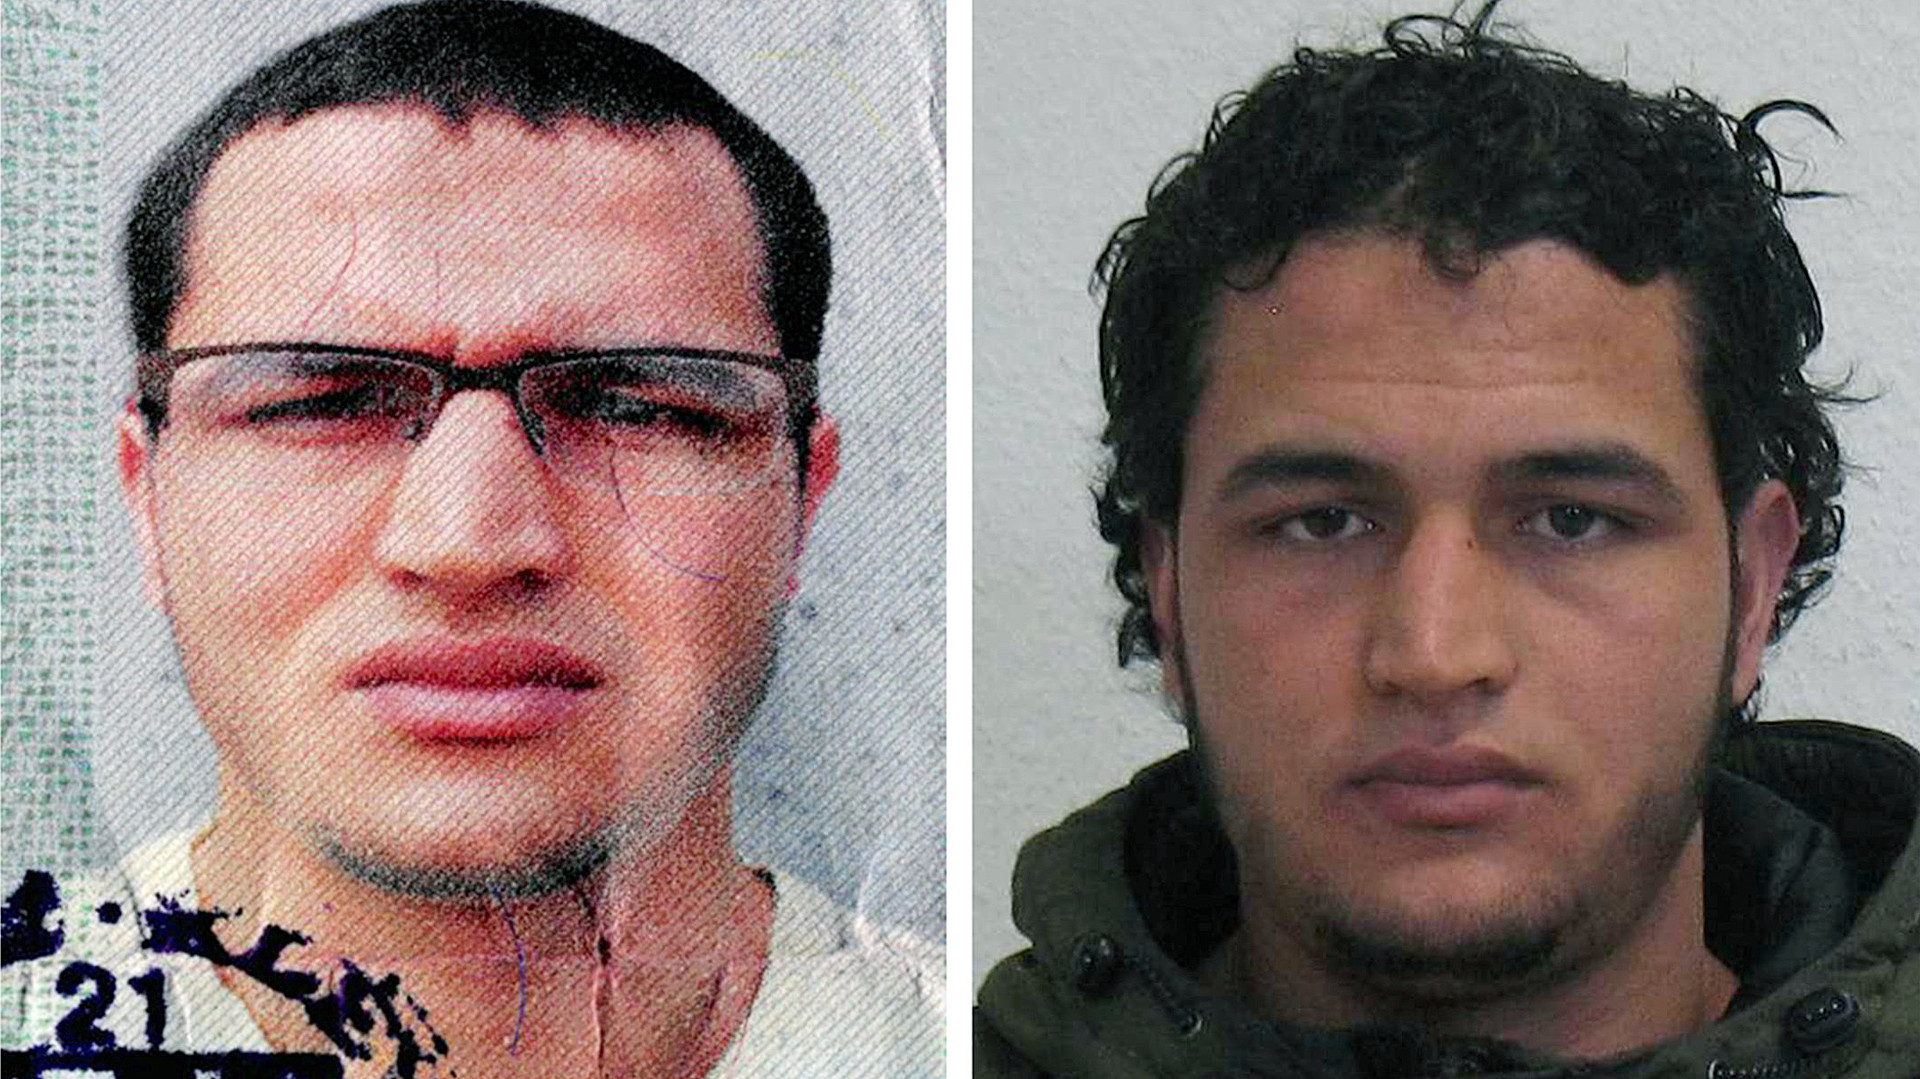 €100 тысяч за террориста: полиция назвала имя водителя грузовика в Берлине